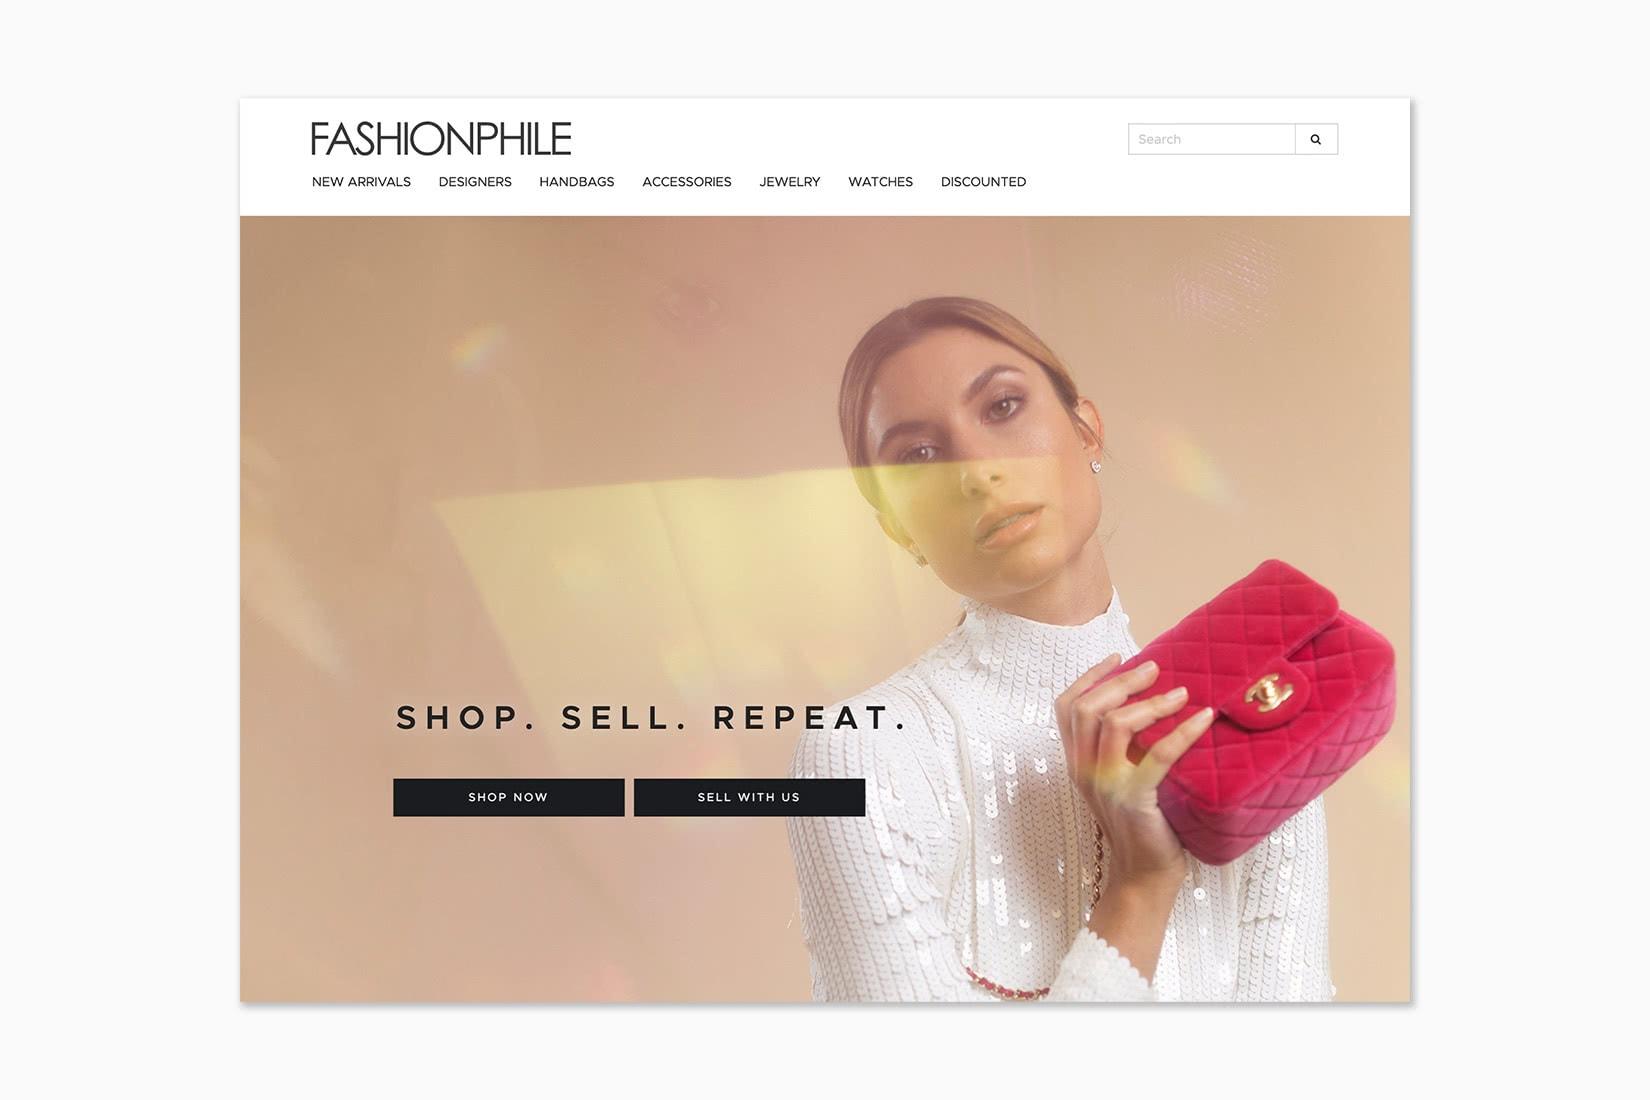 best online shopping sites women fashionphile - Luxe Digital